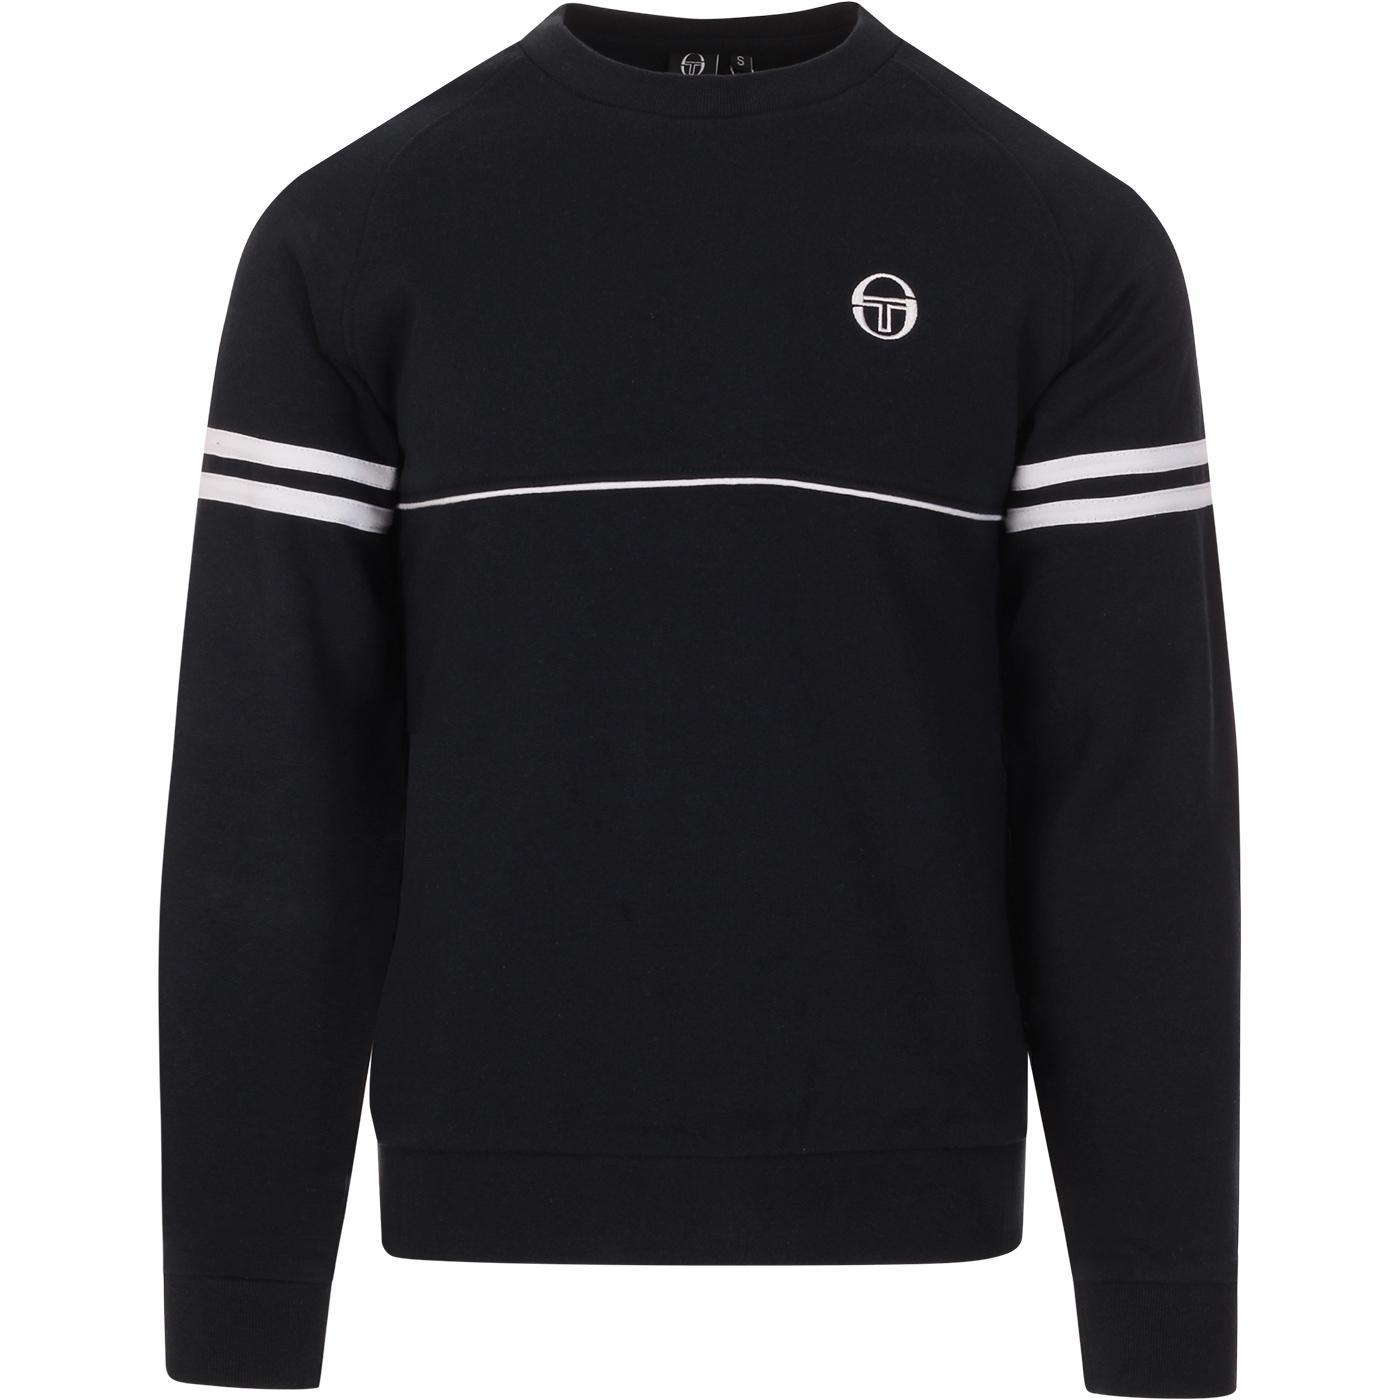 Orion SERGIO TACCHINI Retro 80s Sweatshirt (N/W)